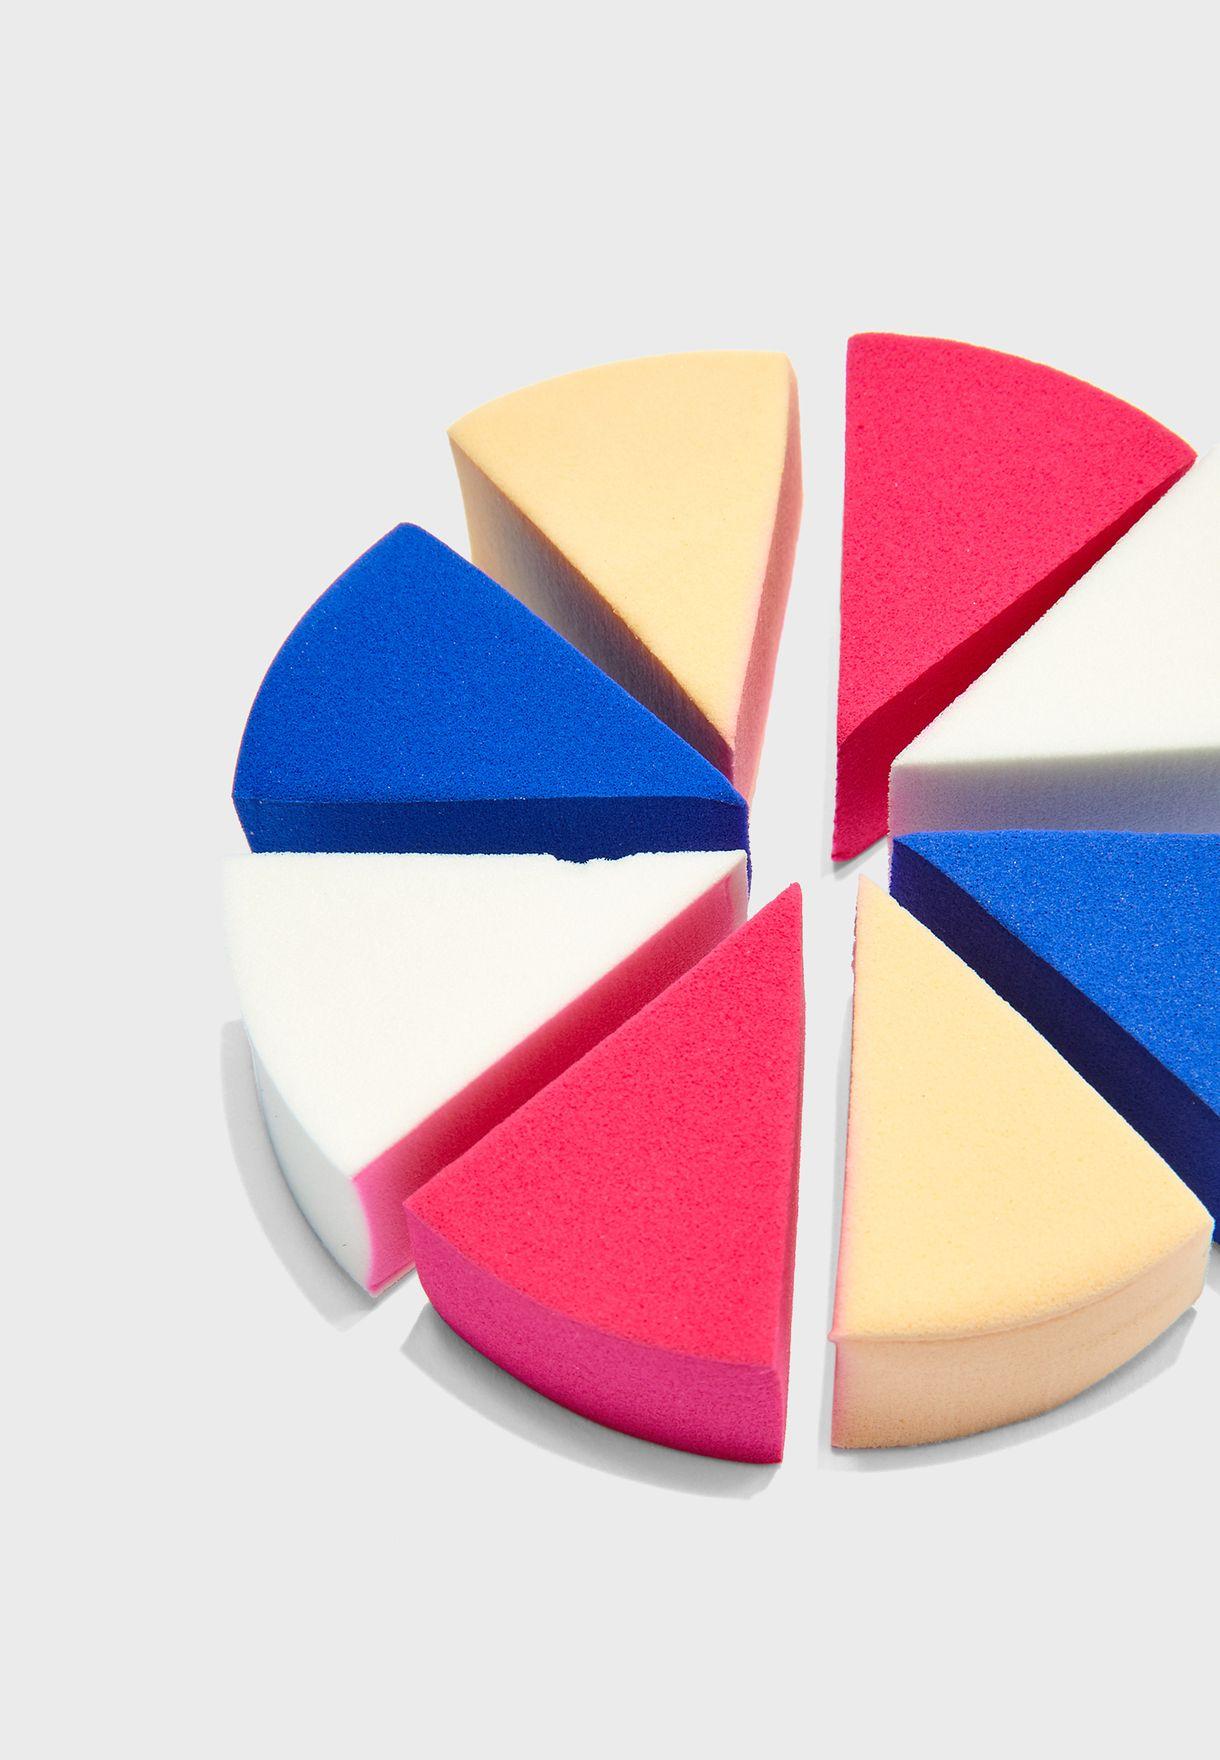 Wonder Wheel Foundation Circle Sponge